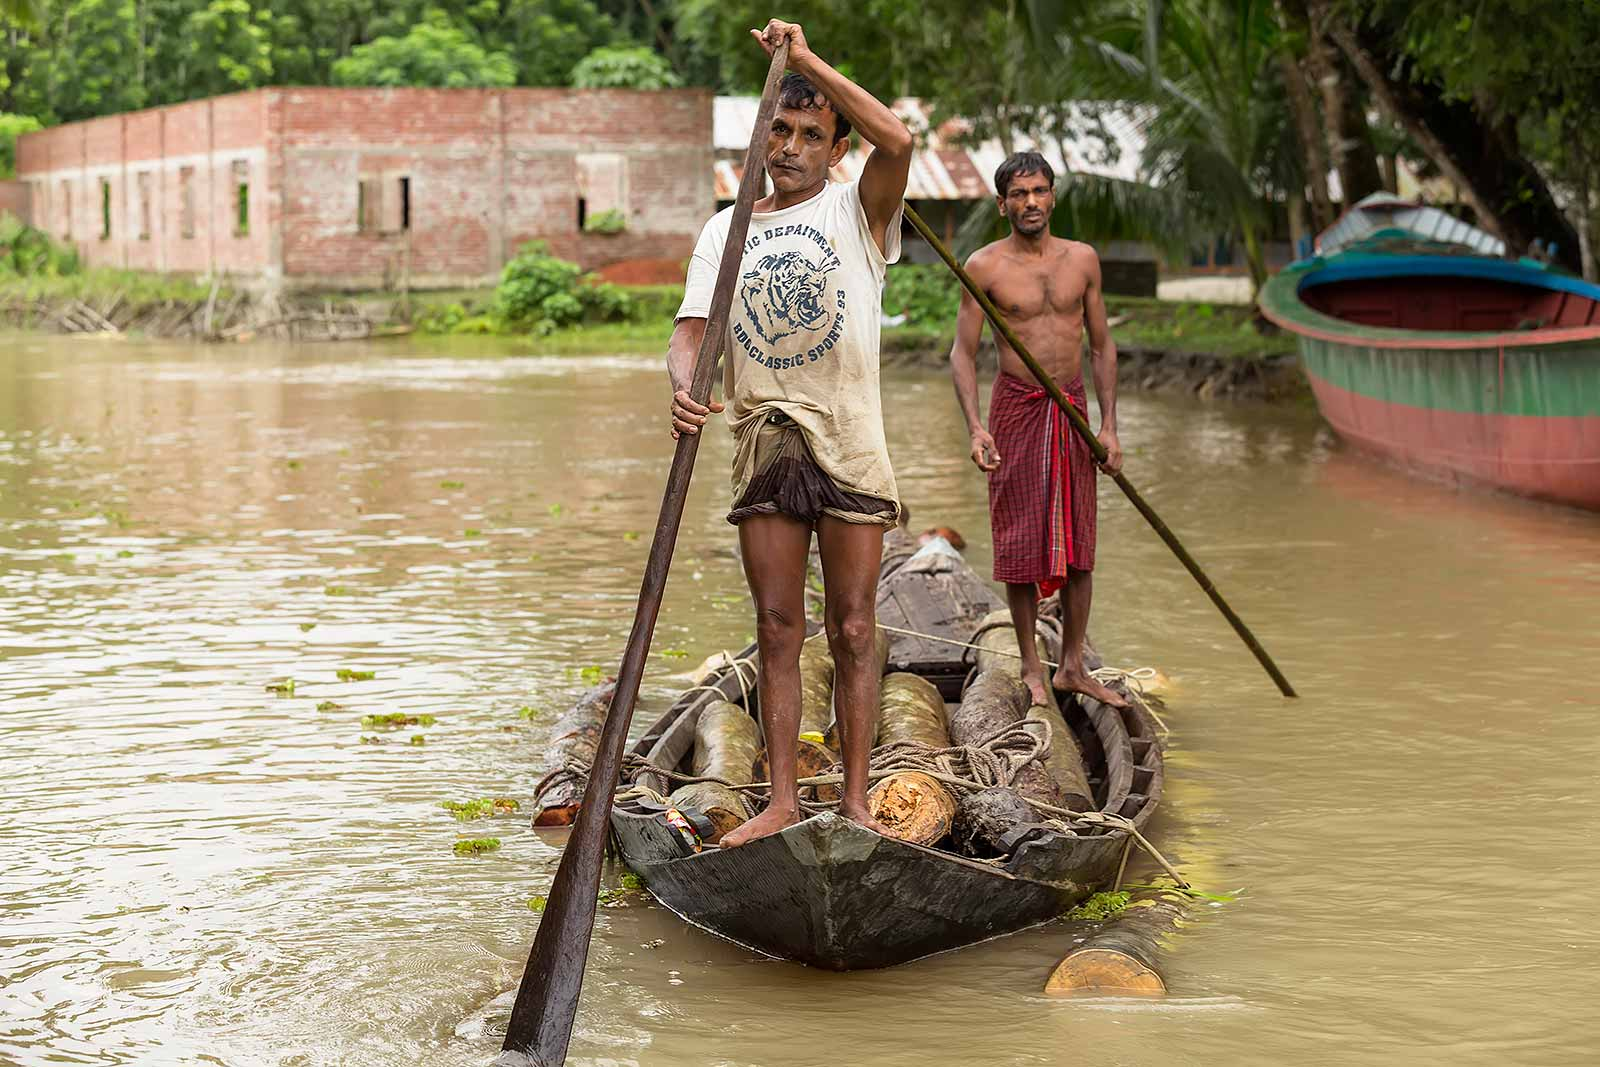 guava-plantations-boat-canal-swarupkathi-bangladesh-3